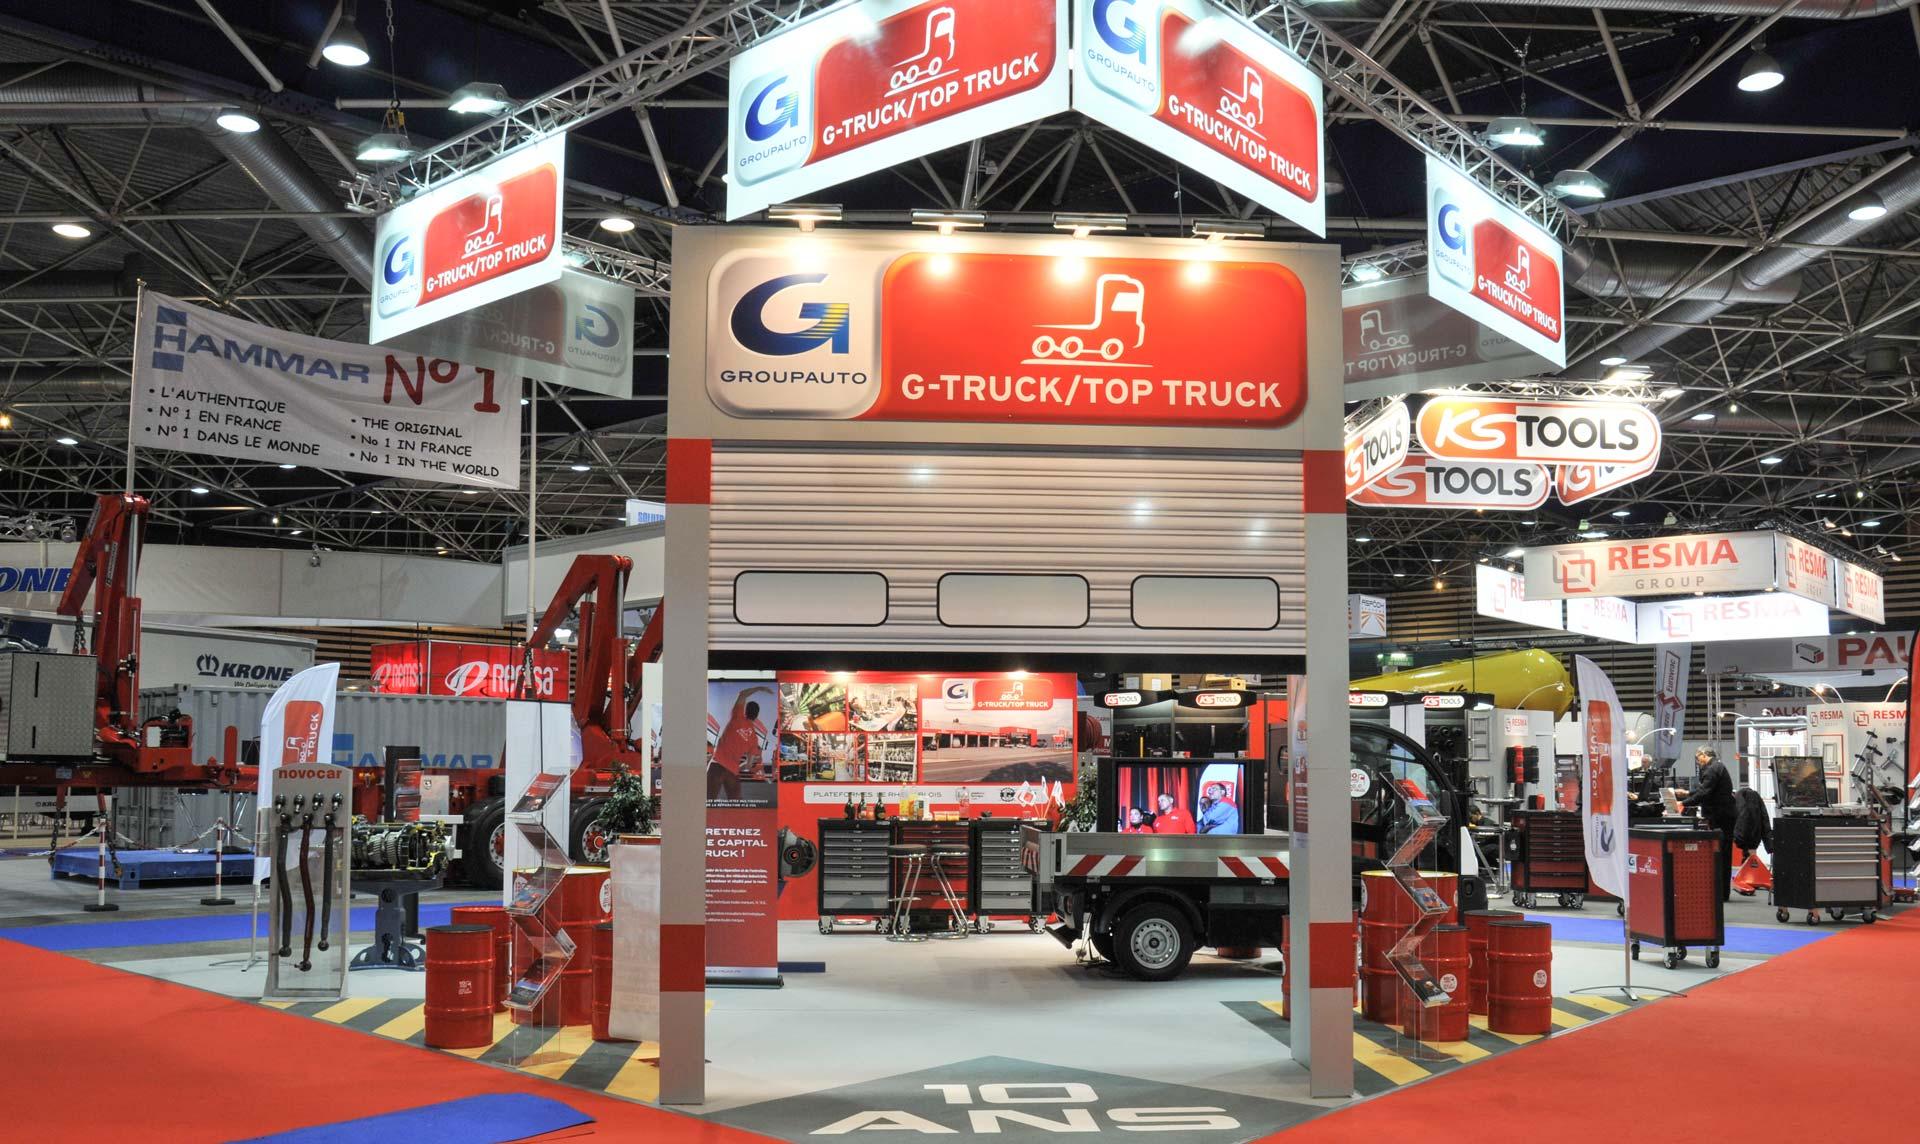 Création du stand G-truck 81 m2